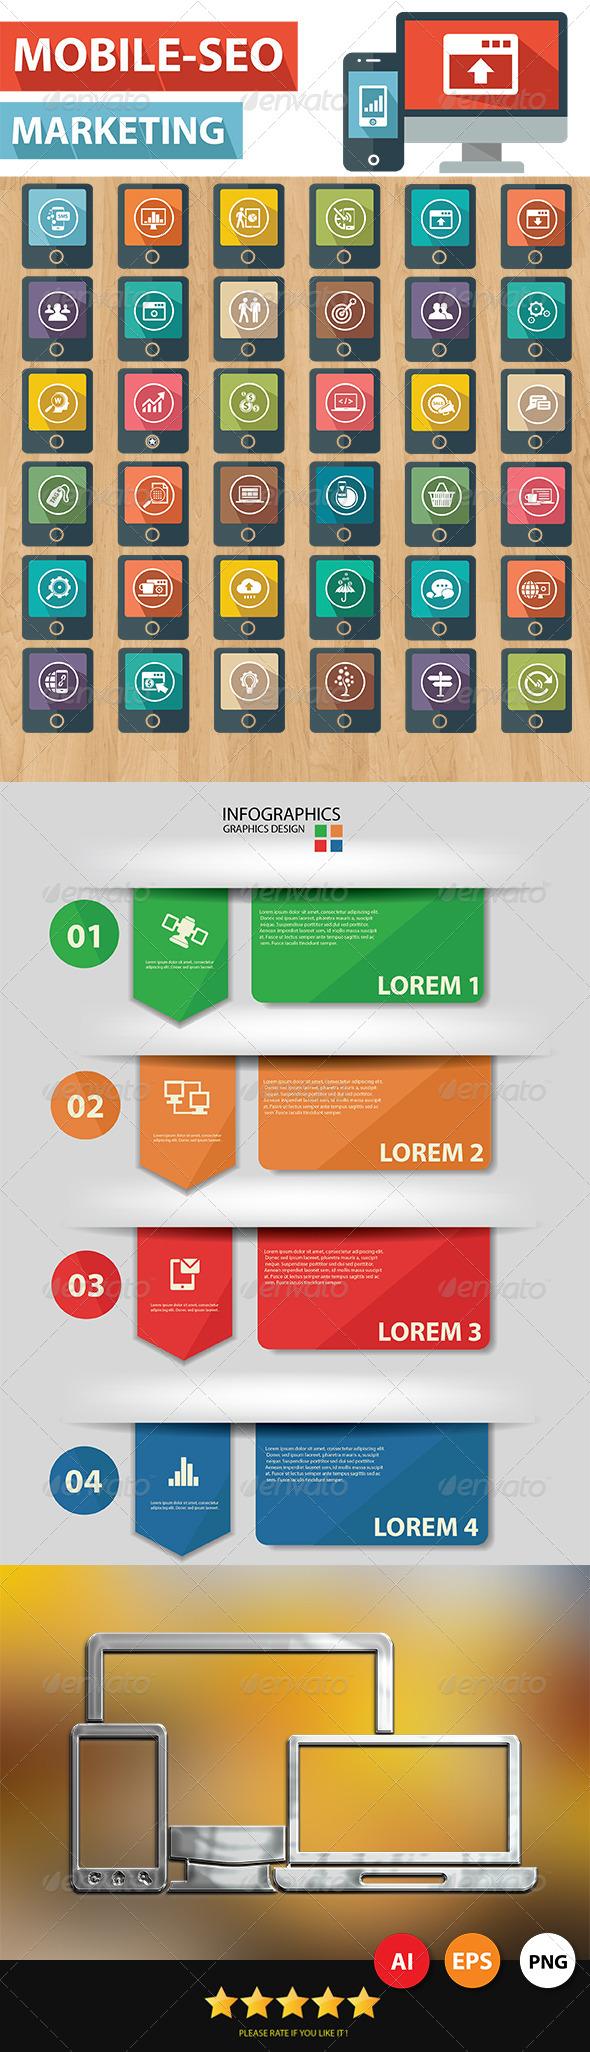 Mobile-SEO Icons - Web Icons